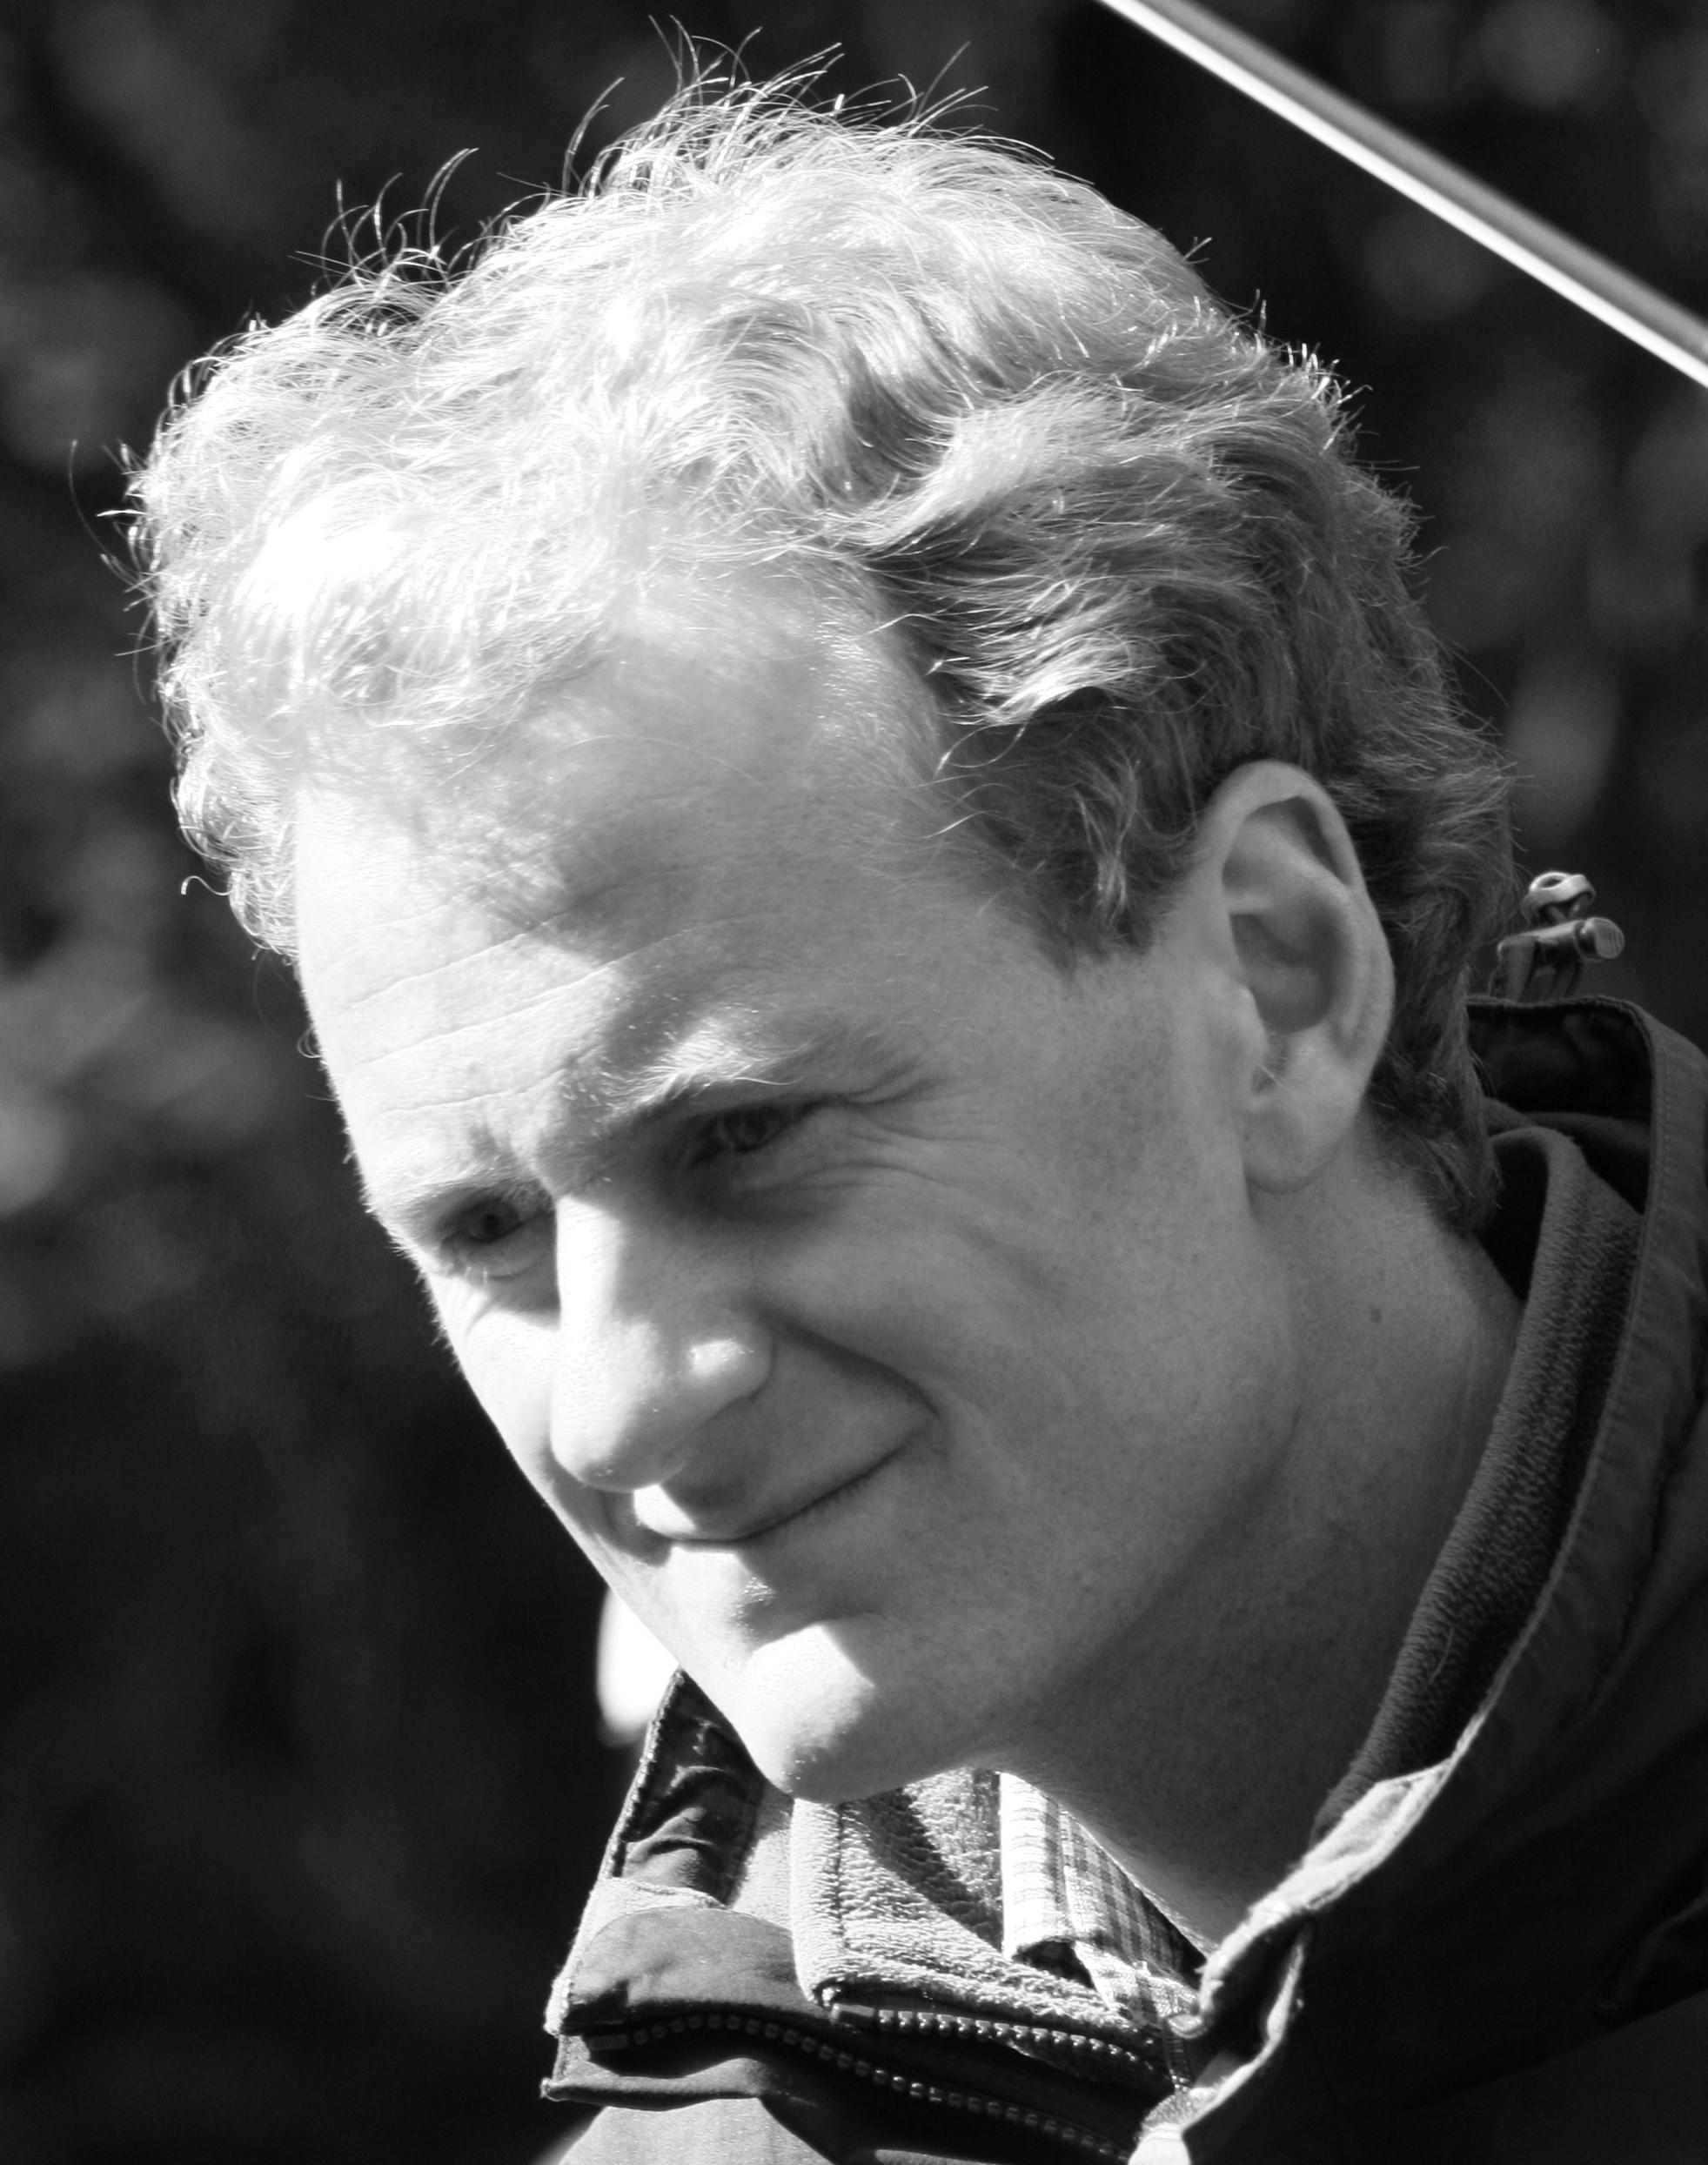 James Macdonald Lockhart